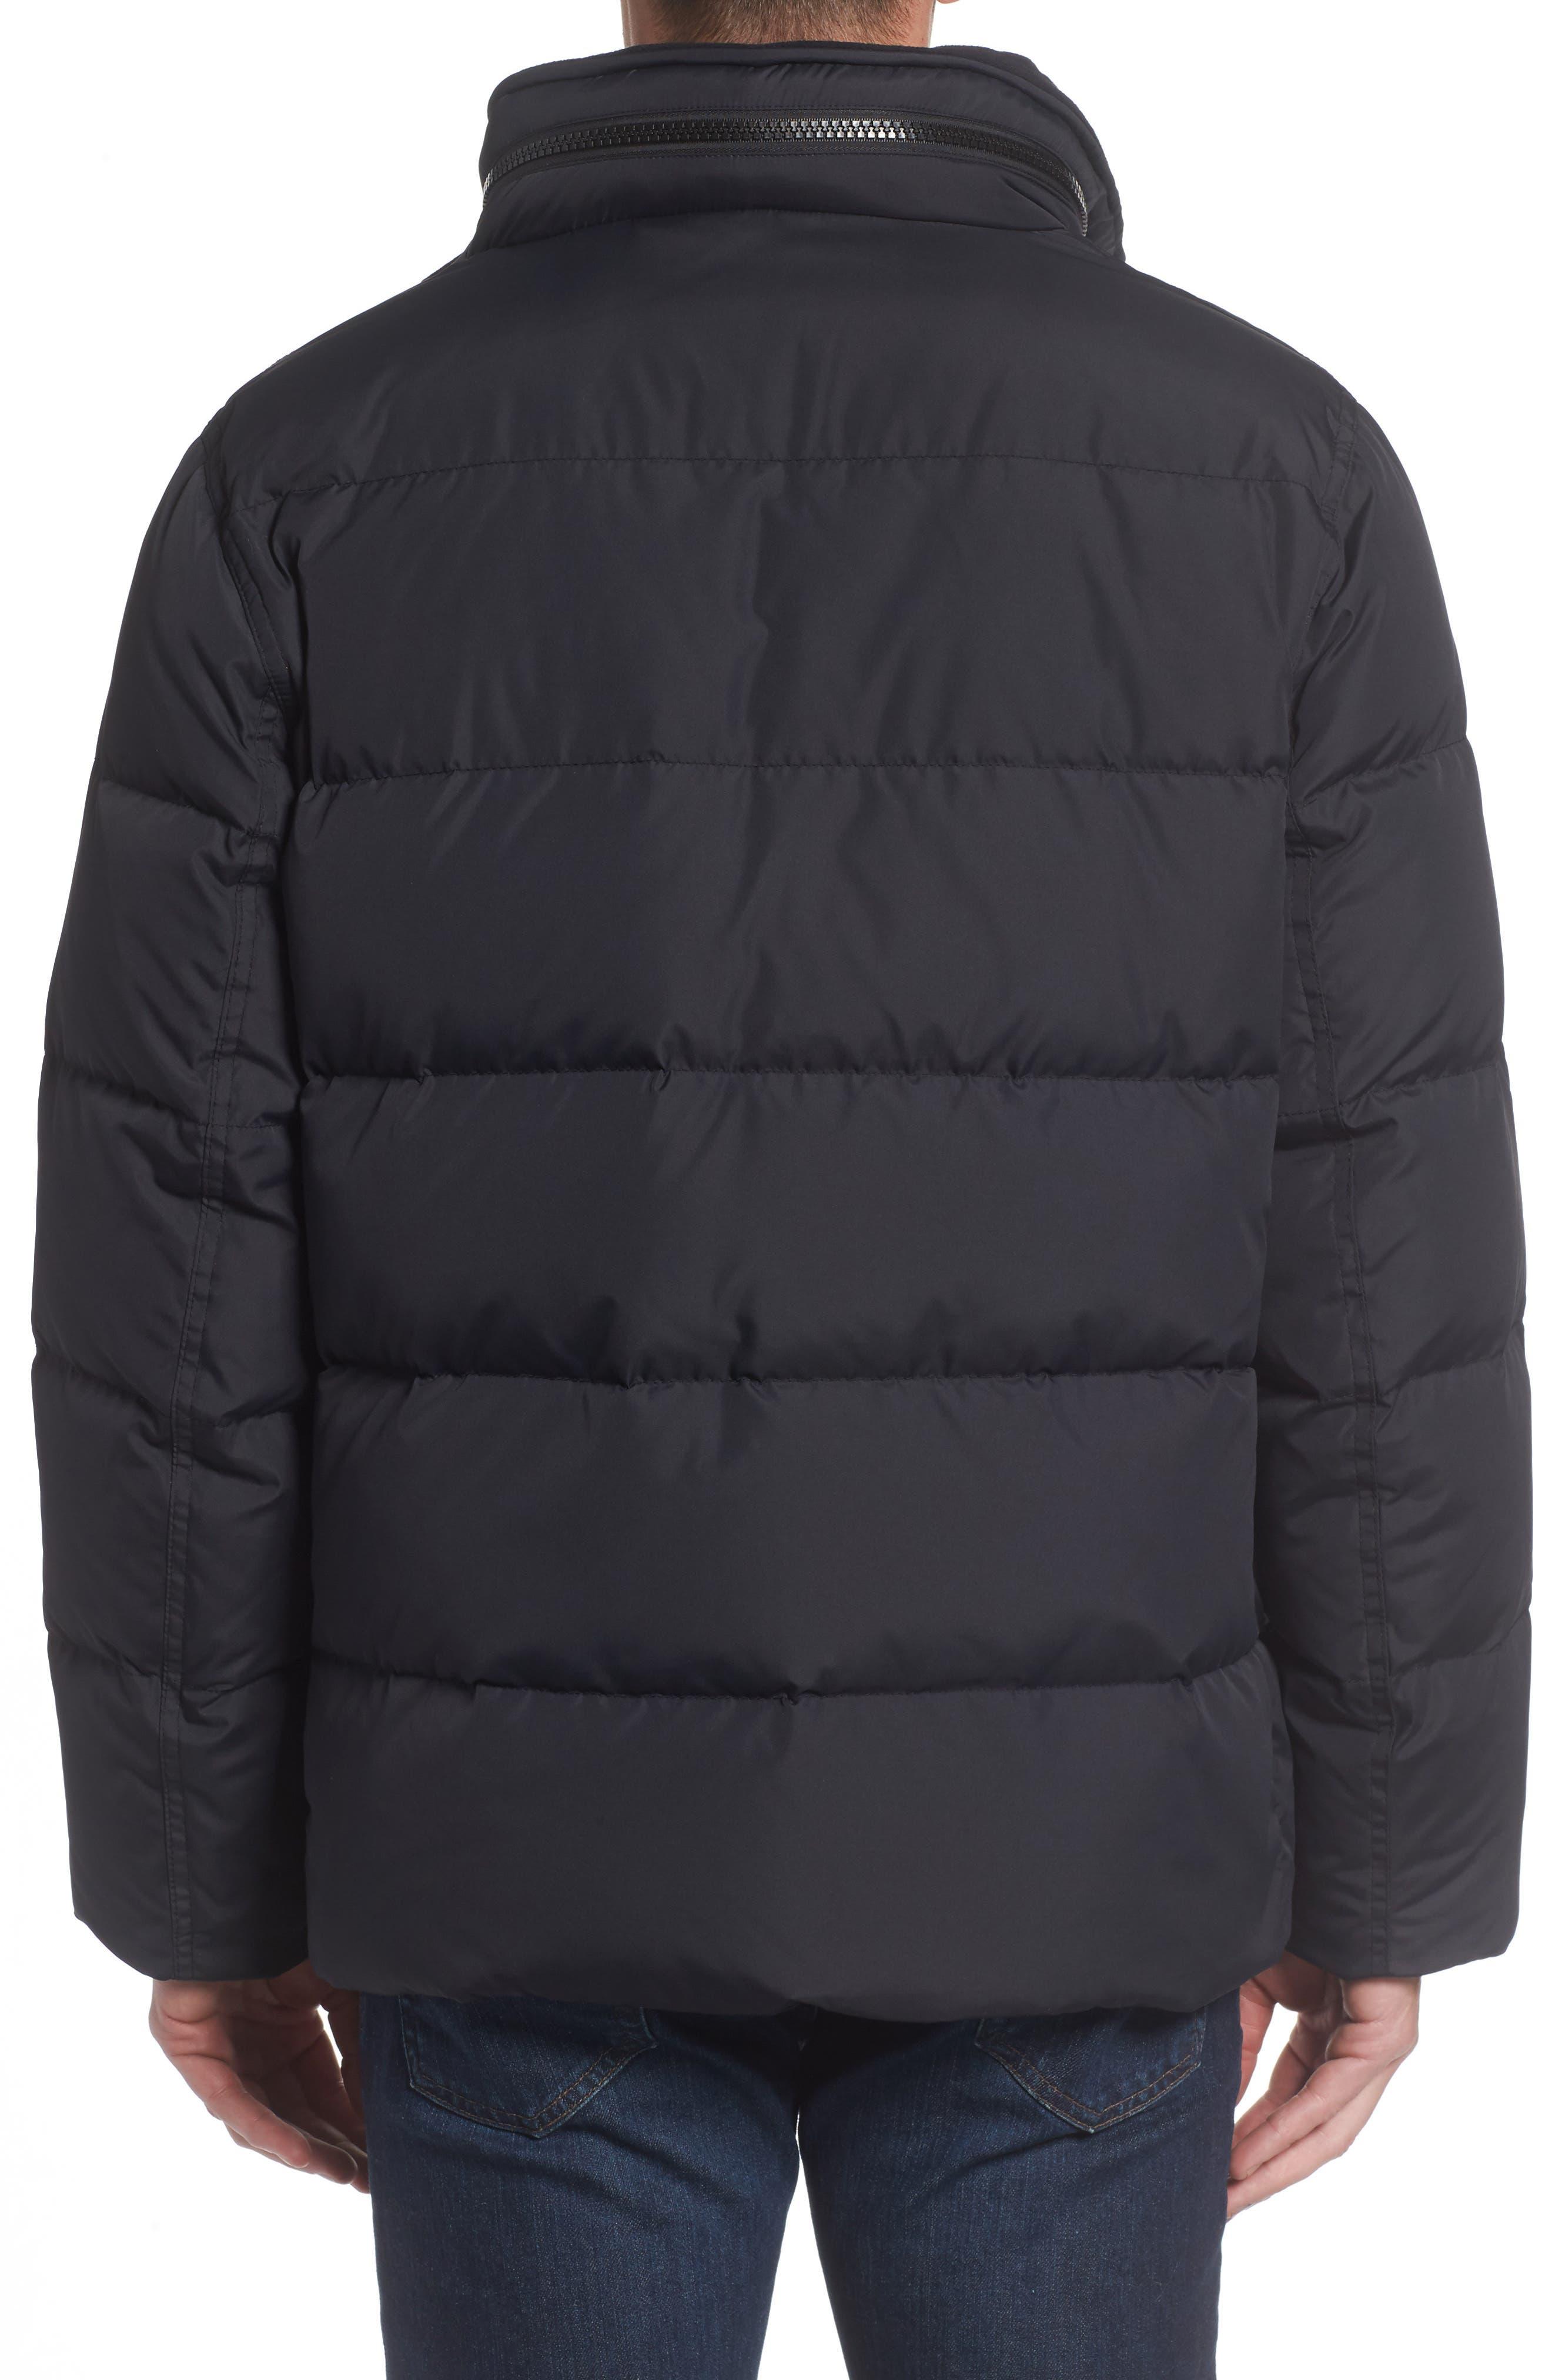 Mrc black parka jacket